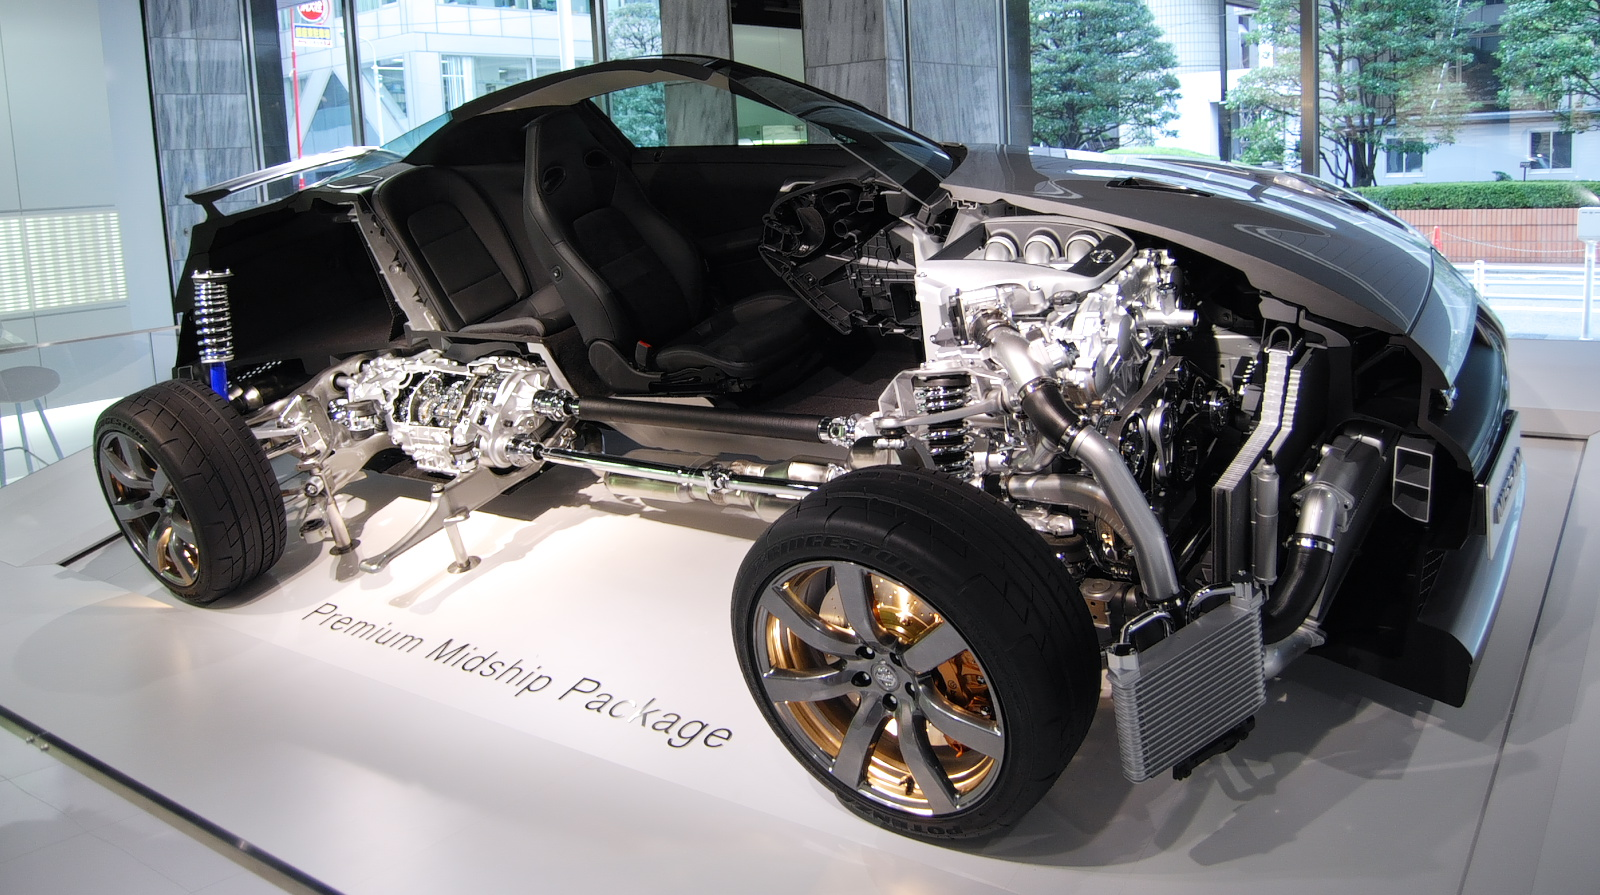 Brz Vs Wrx >> Nissan GTR cutmodel - Track|FEVER